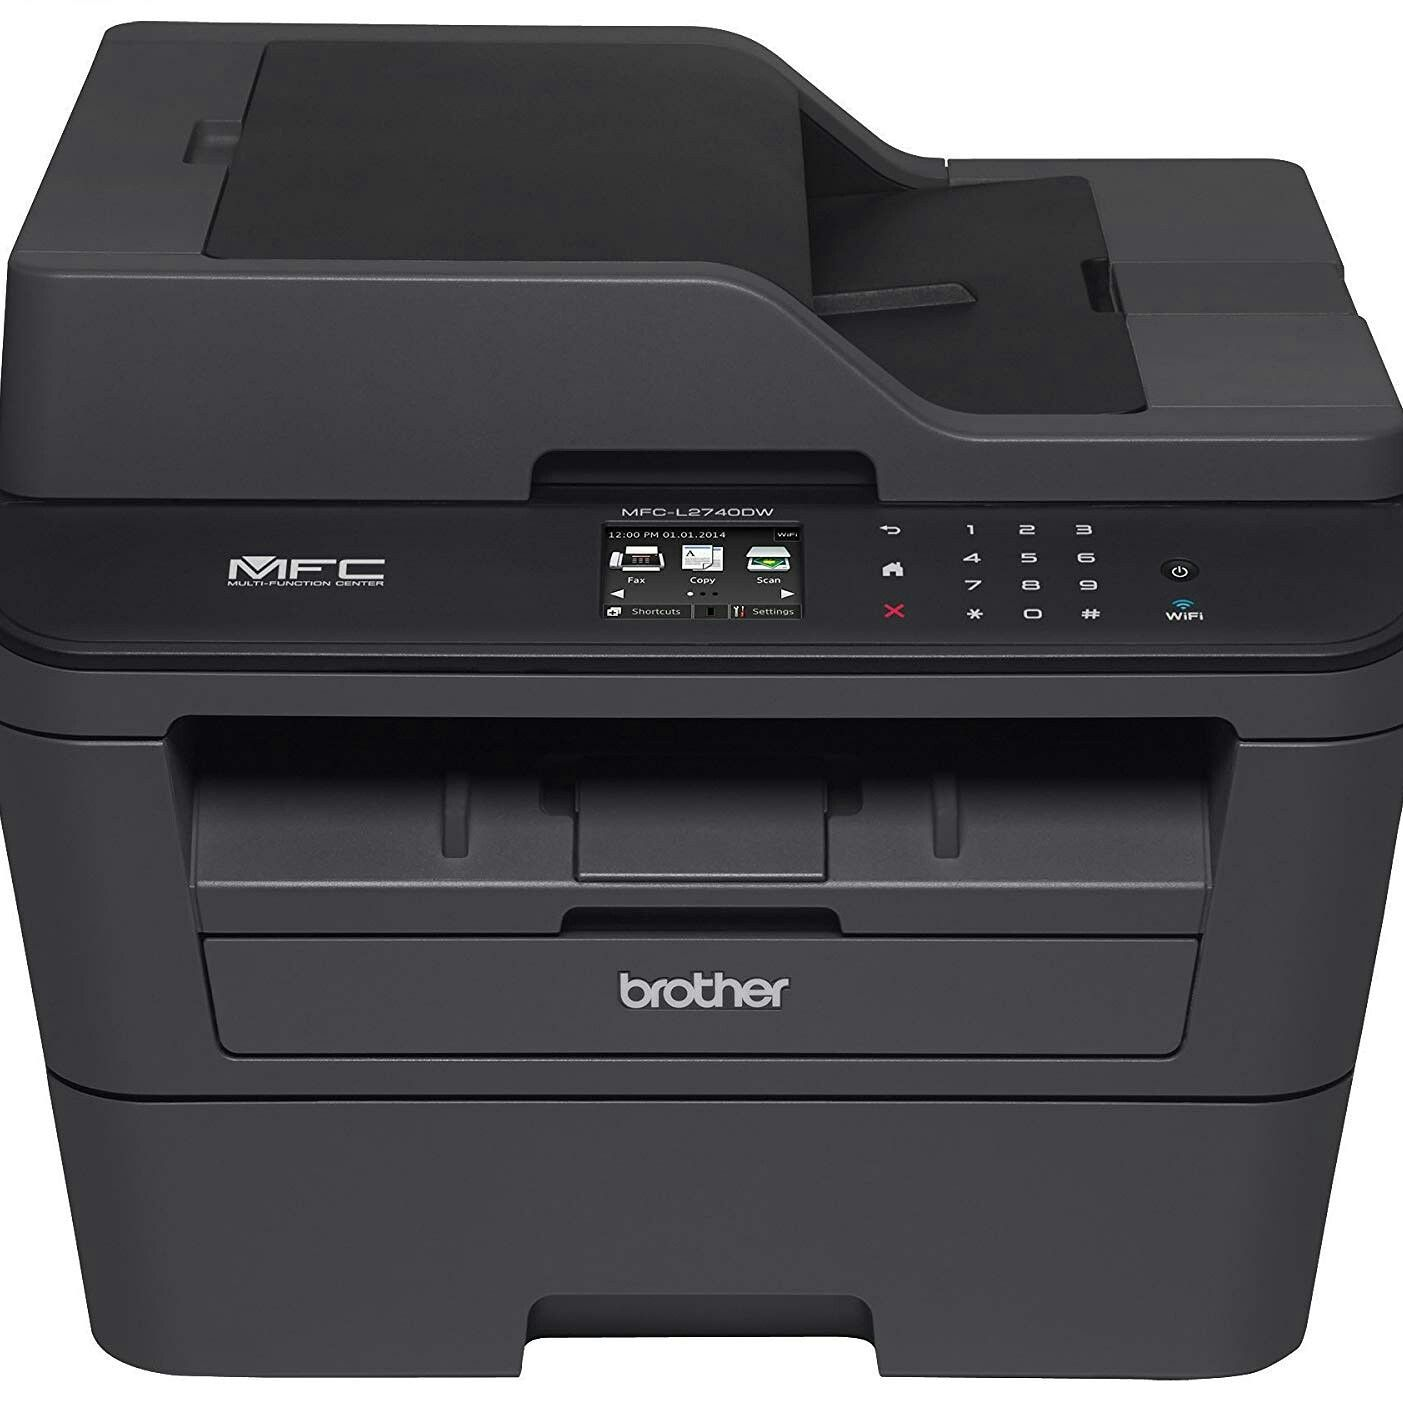 Brother Printer MFCL2740DW Wireless Monochrome Printer